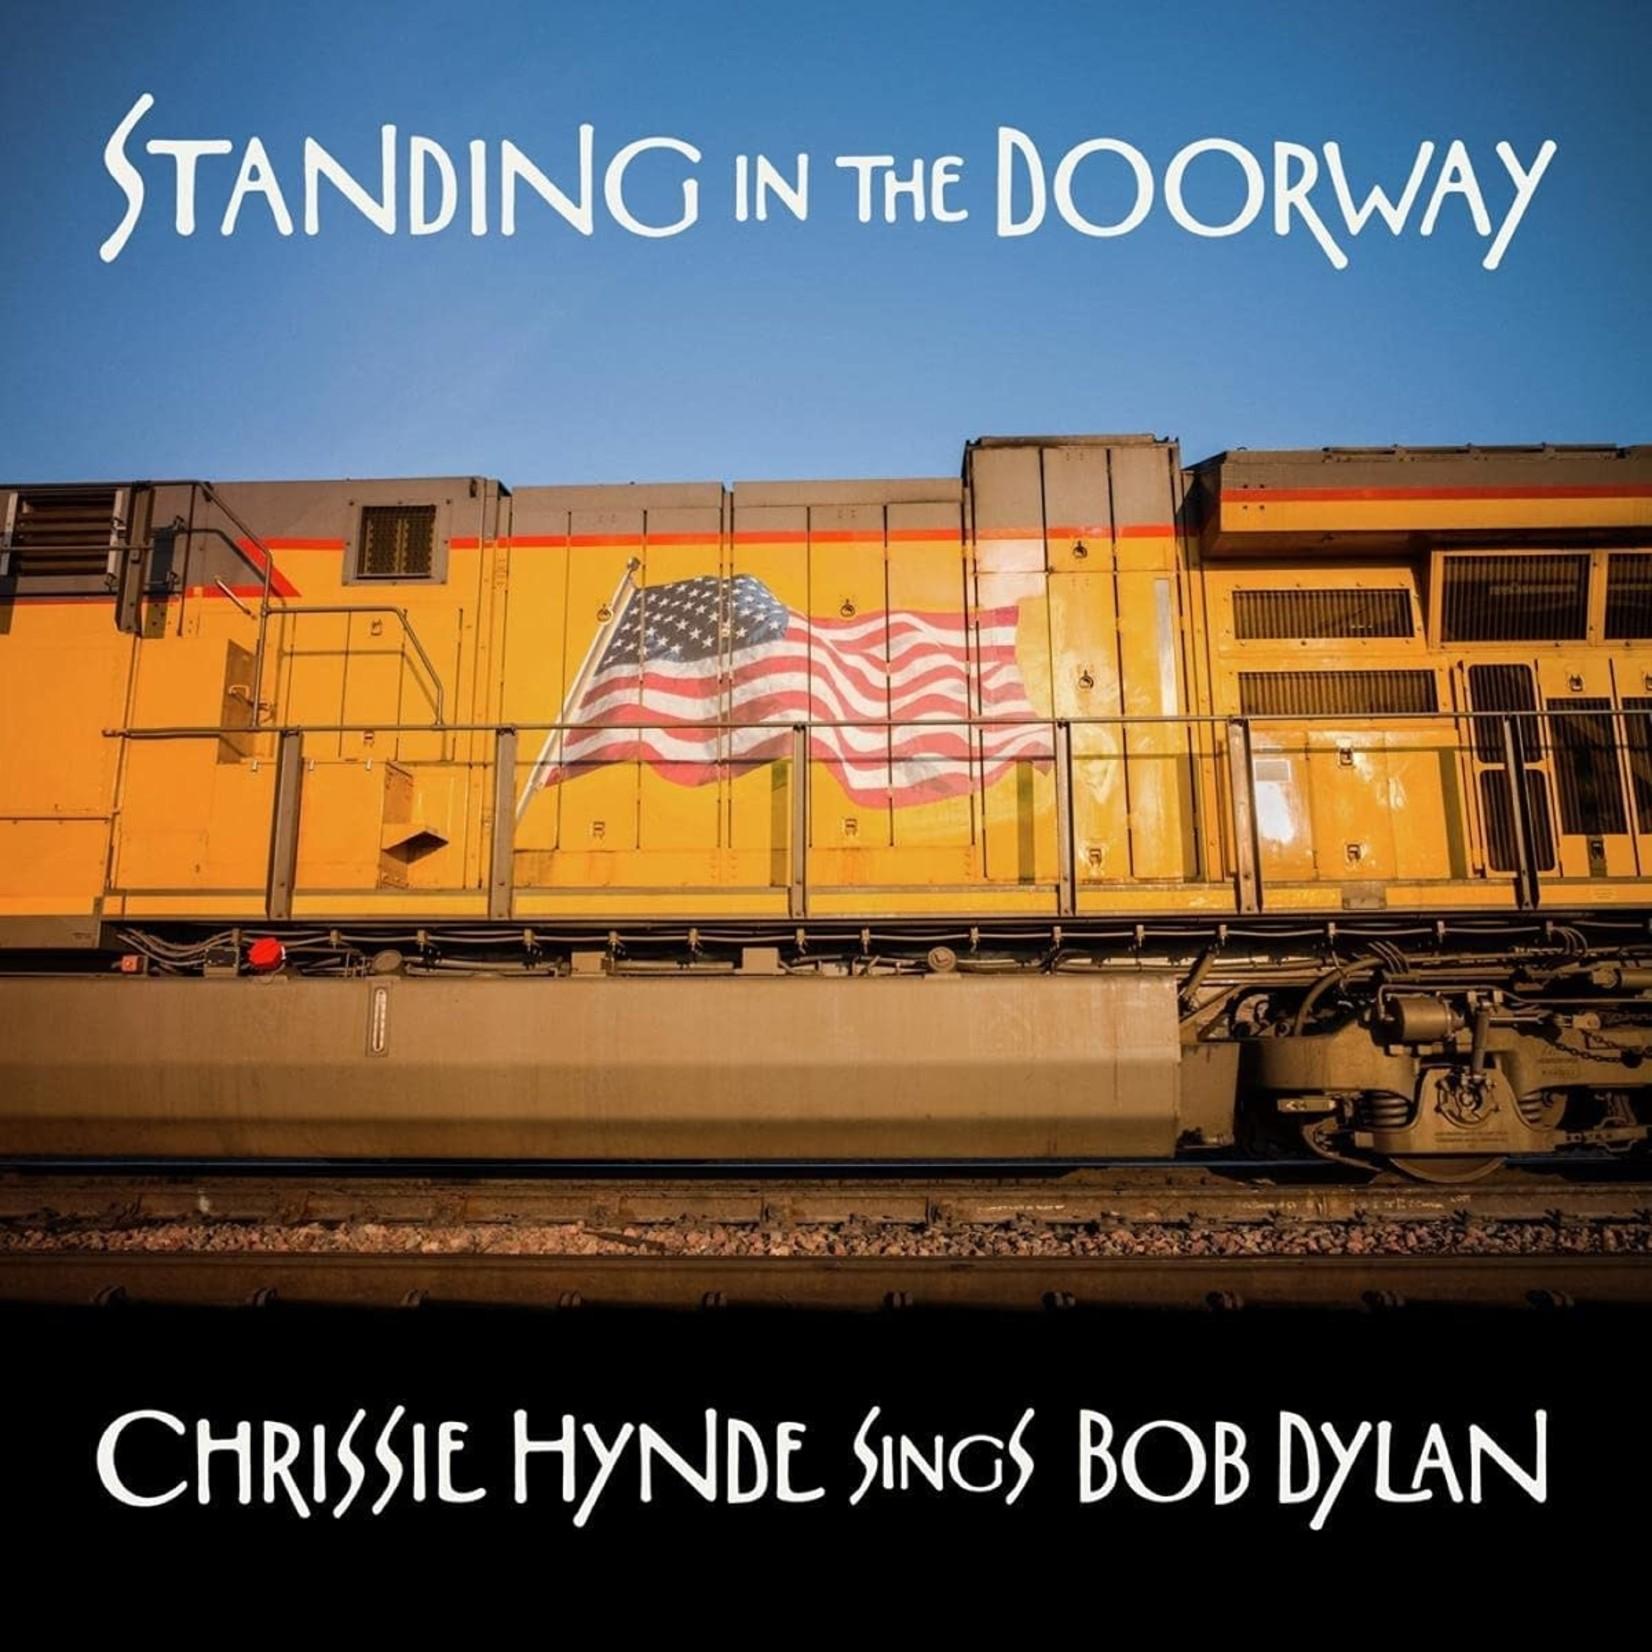 CHRISSIE HYNDE STANDING IN THE DOORWAY: CHRISSIE HYNDE SINGS BOB DYLAN (LP)